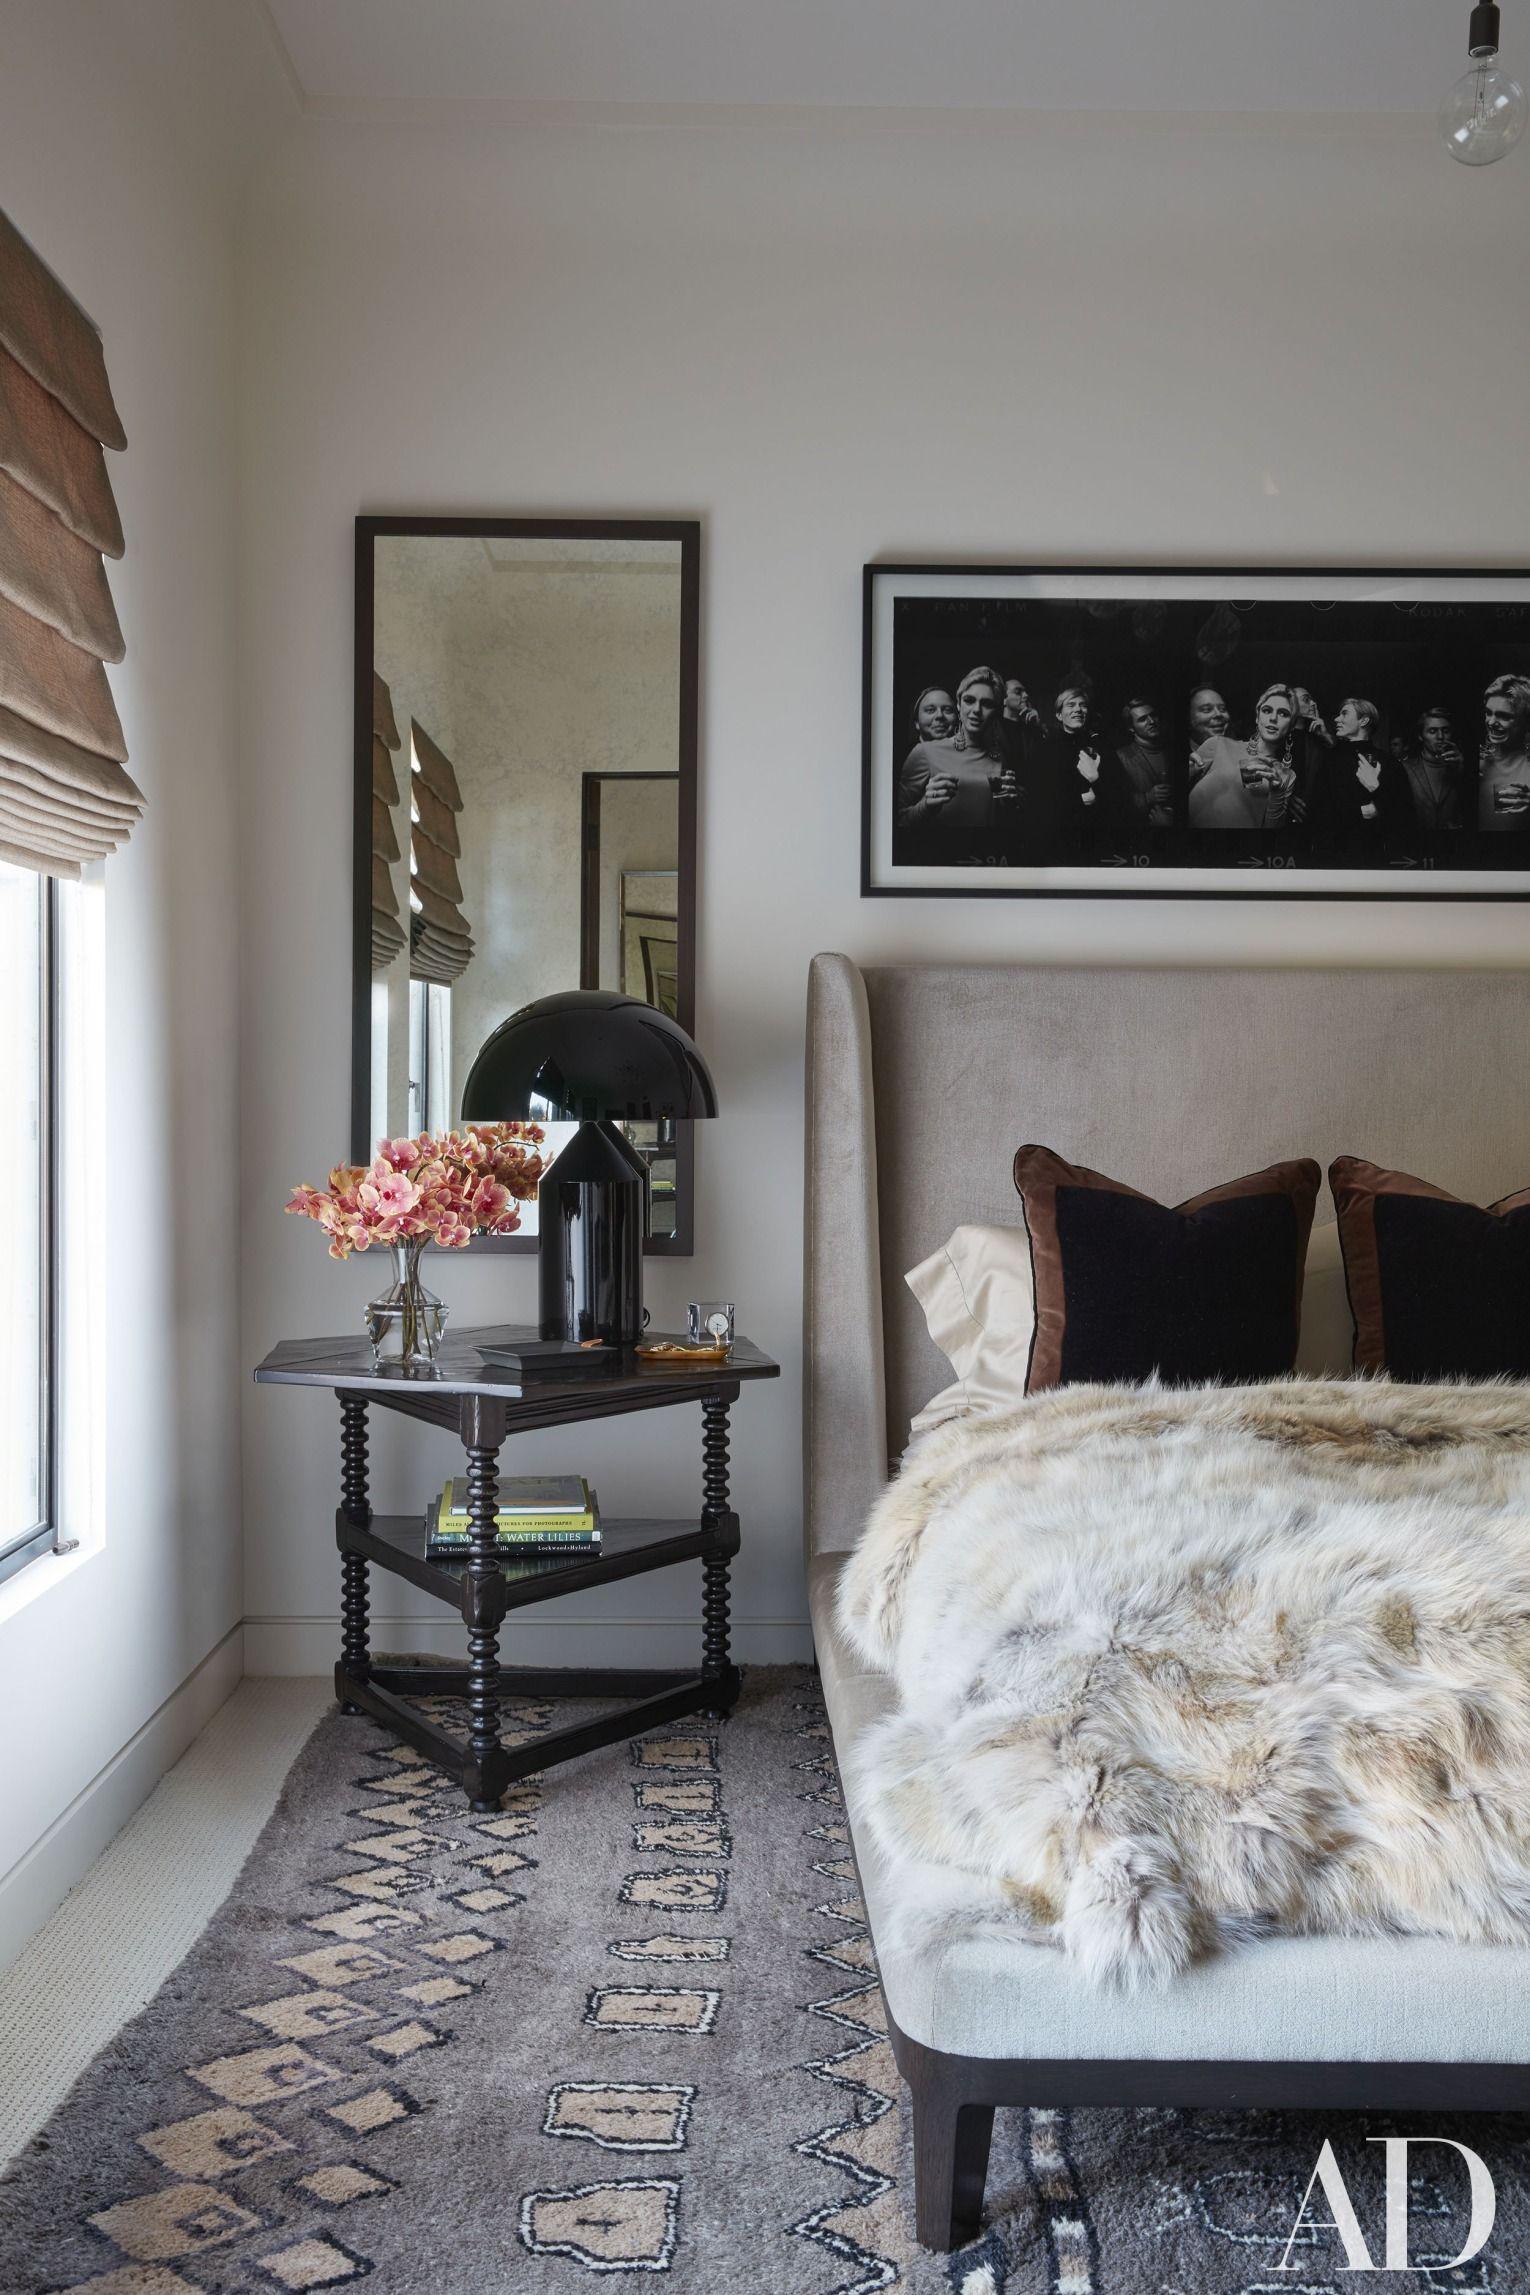 khlo and kourtney kardashian realize their dream homes in rh pinterest com